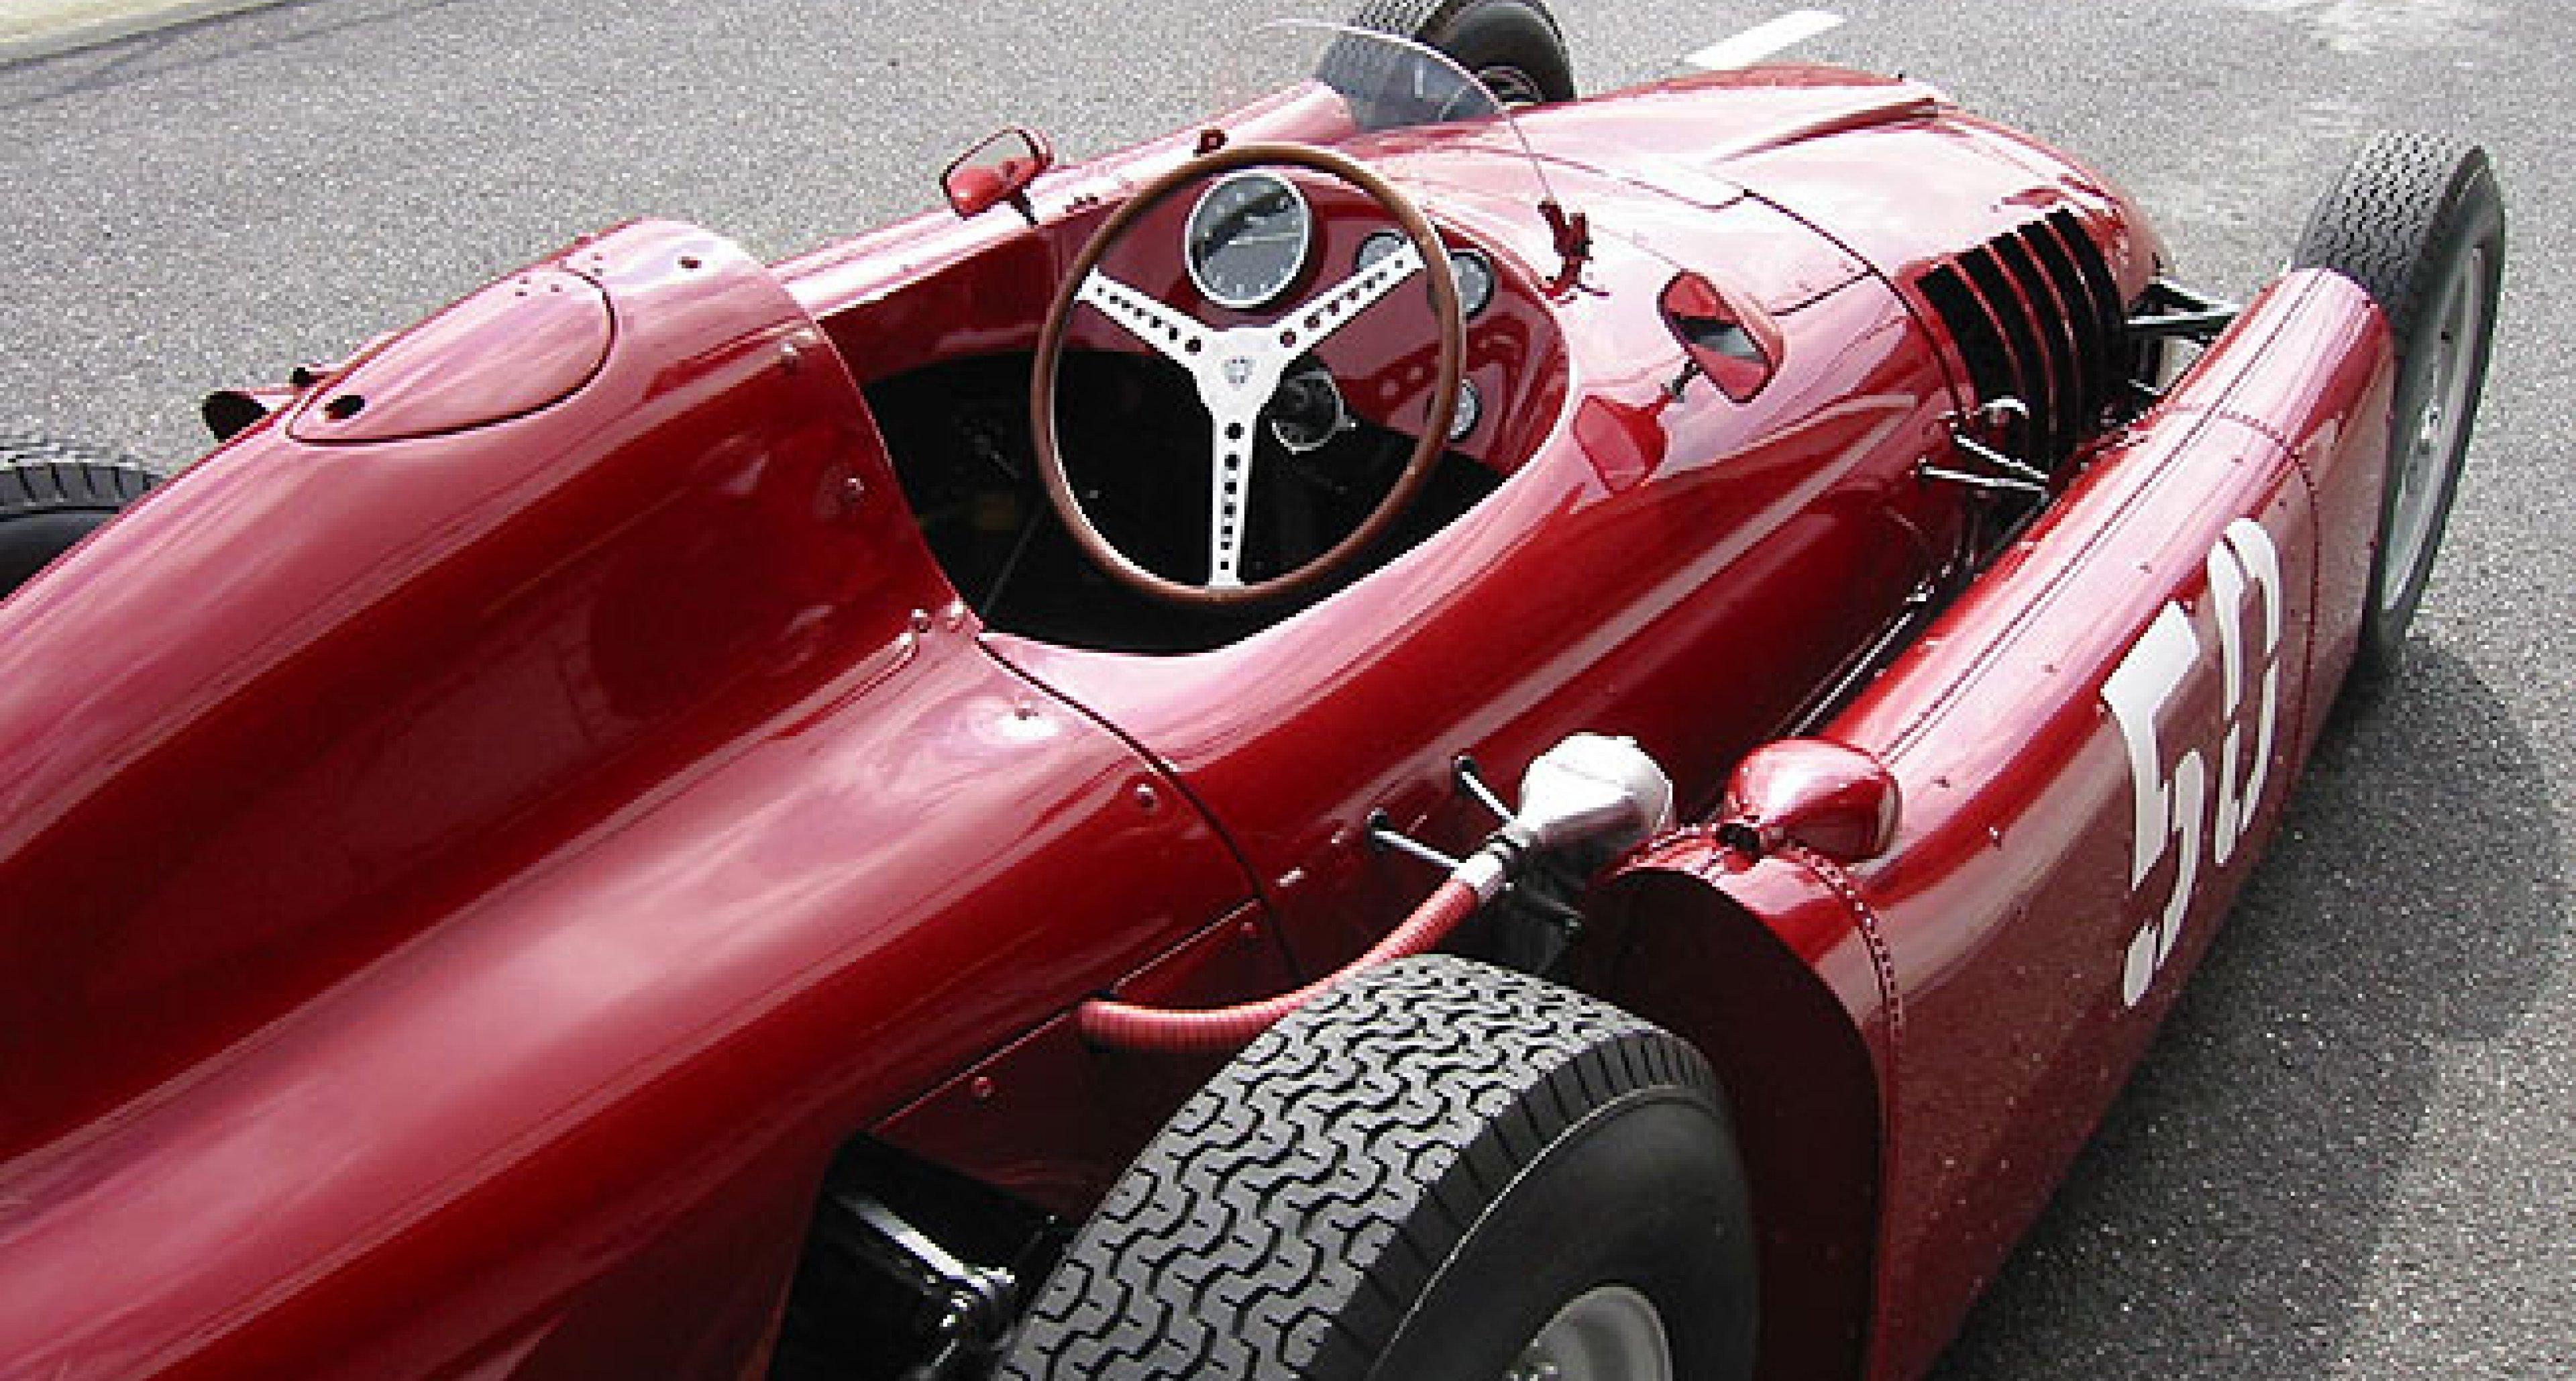 Recreation of the Lancia D50 Grand Prix Car